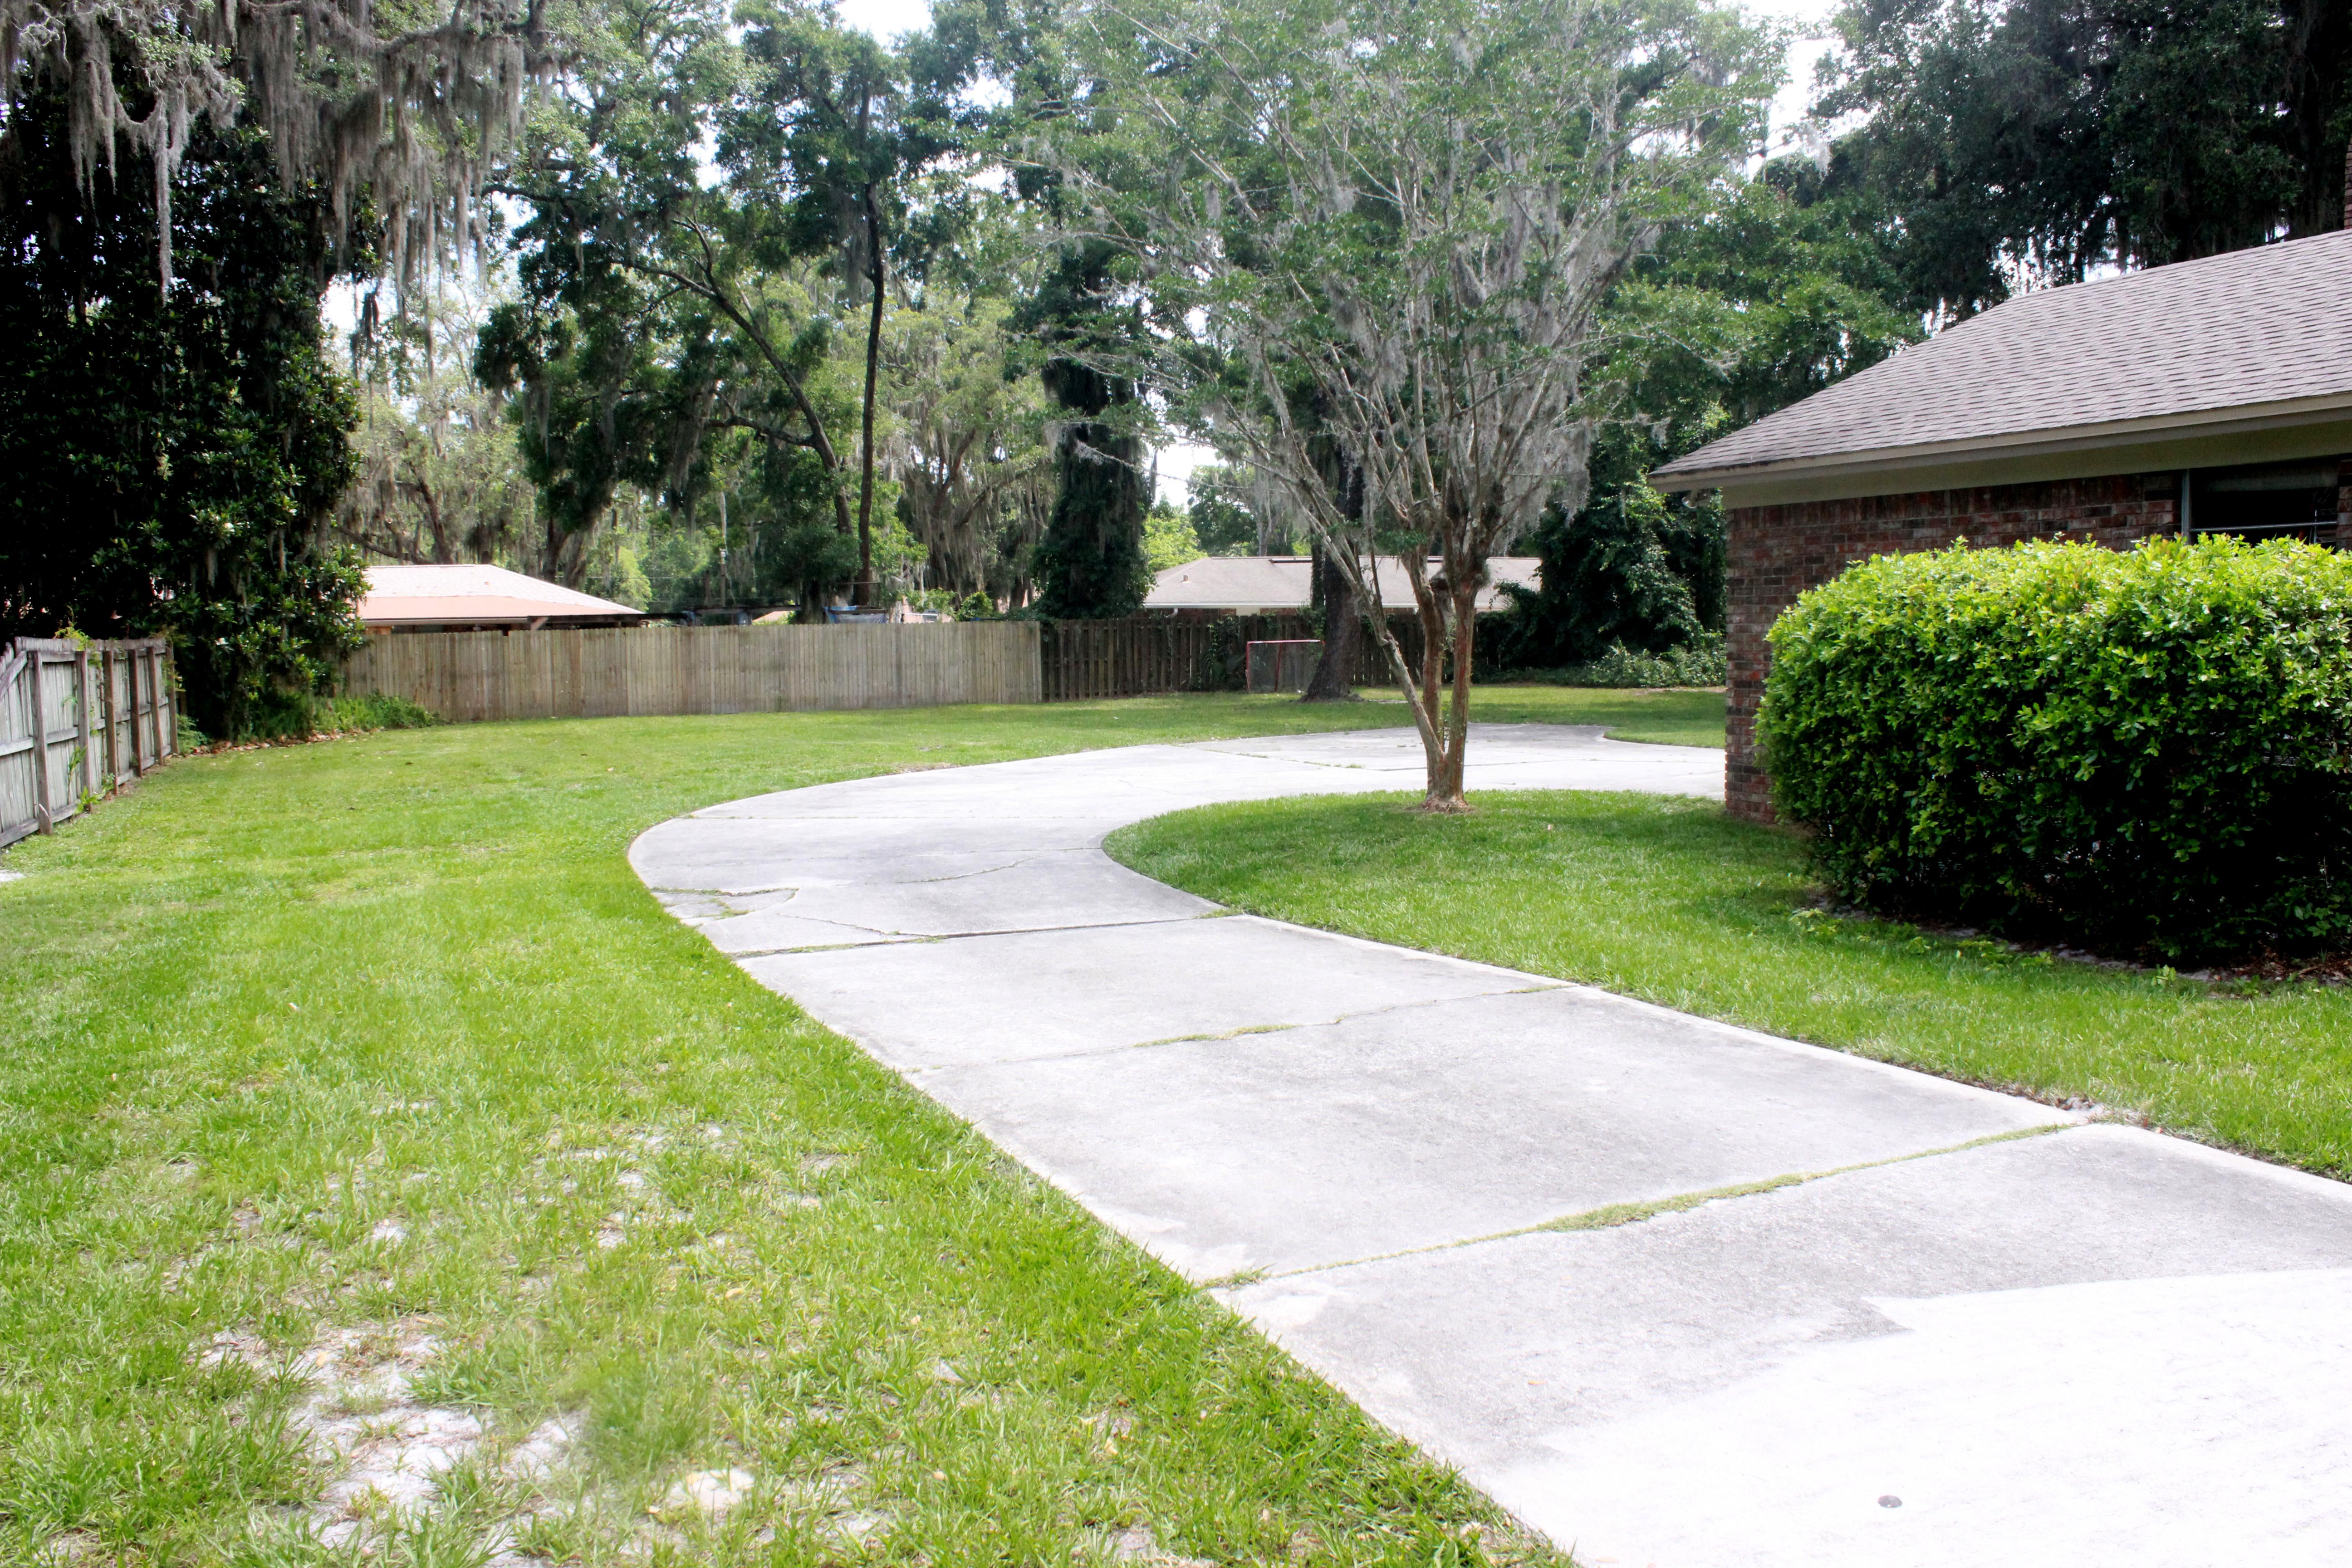 Driveway_Backyard-2